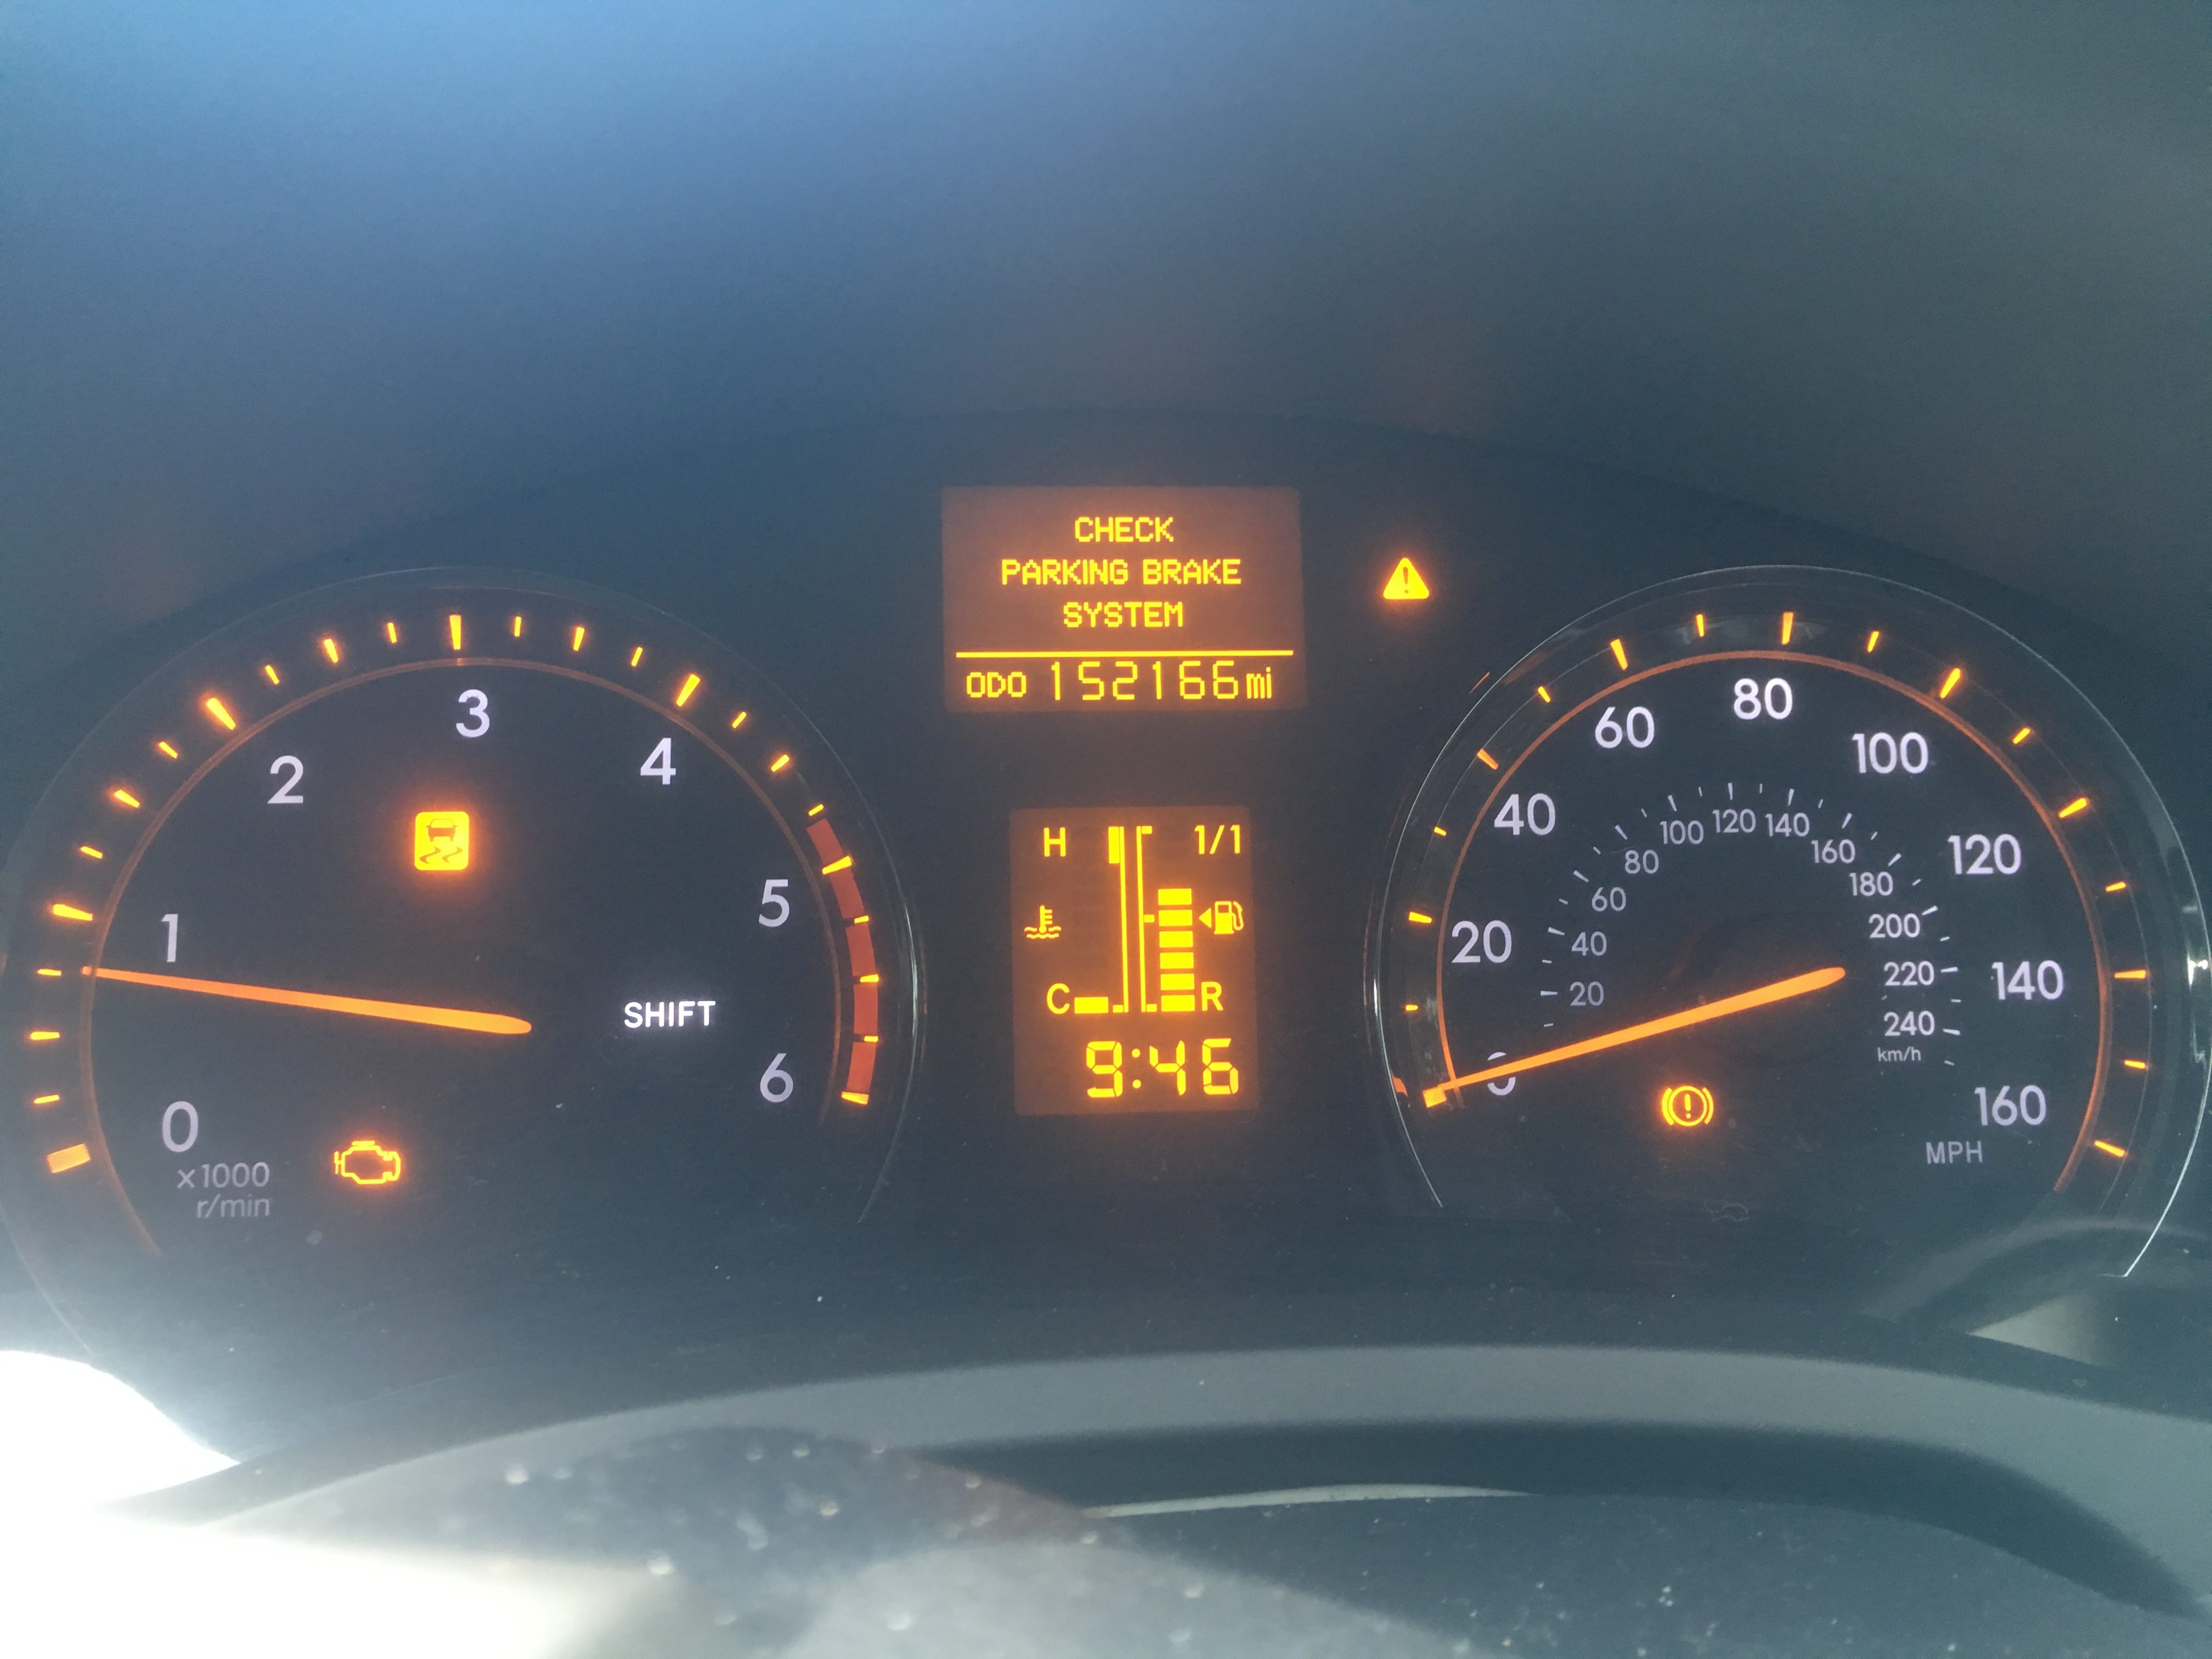 Toyota Avensis Fault Code C1201 - Avensis Club